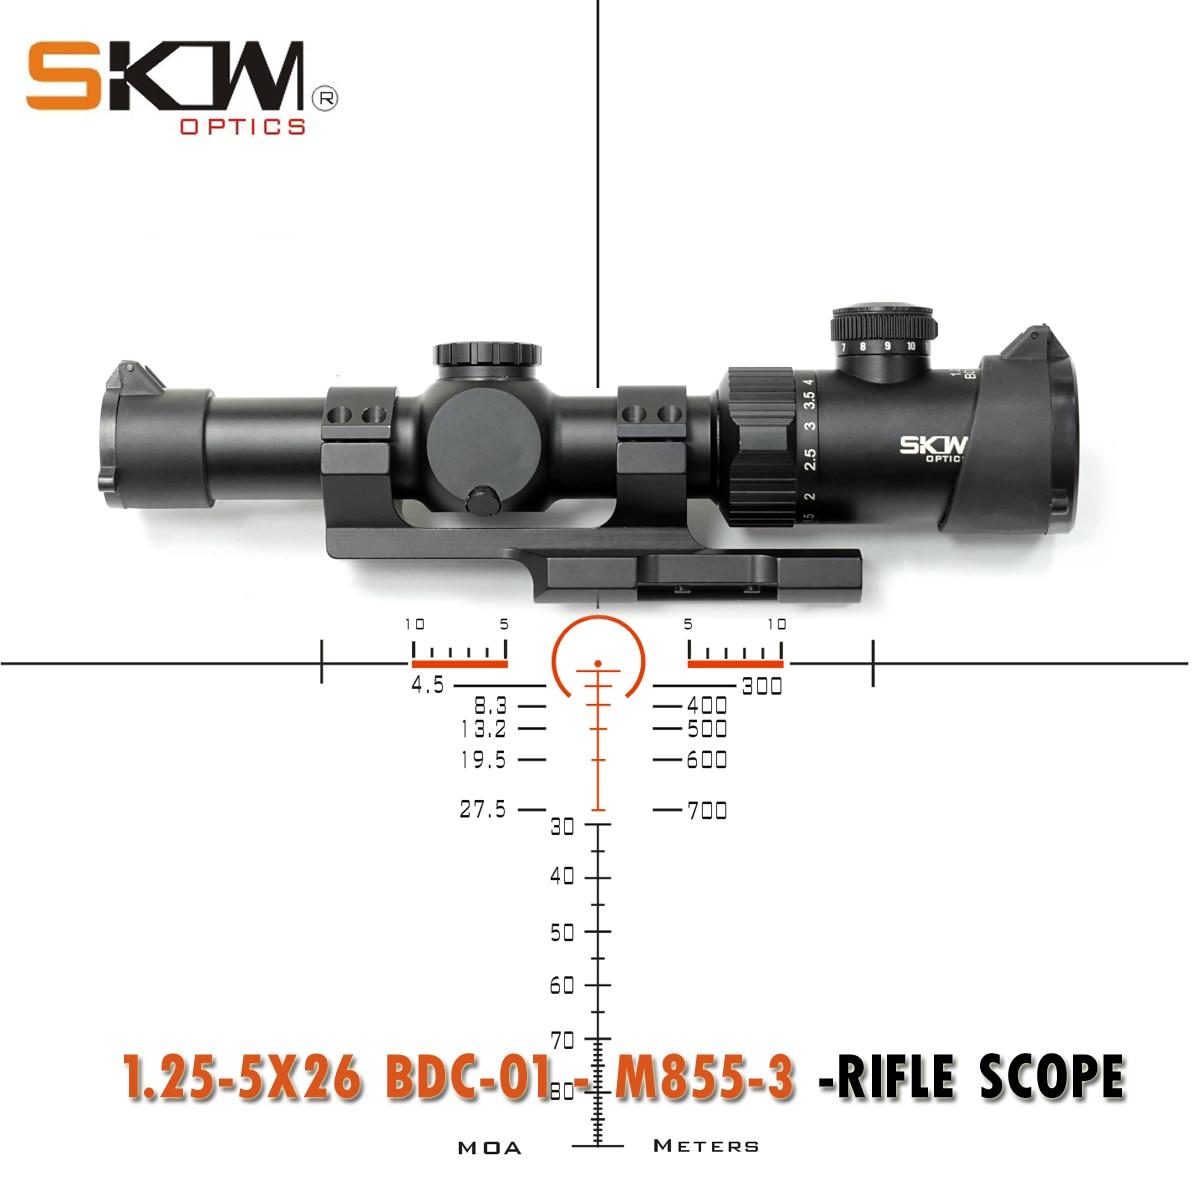 SKWoptics1.25-5x26bdc-01-M855-3 Tactical Riflescopes Hunting AR,M4  Sight Compact Rifle Scope Ar15 BDC Reticle 30 Scope Rings